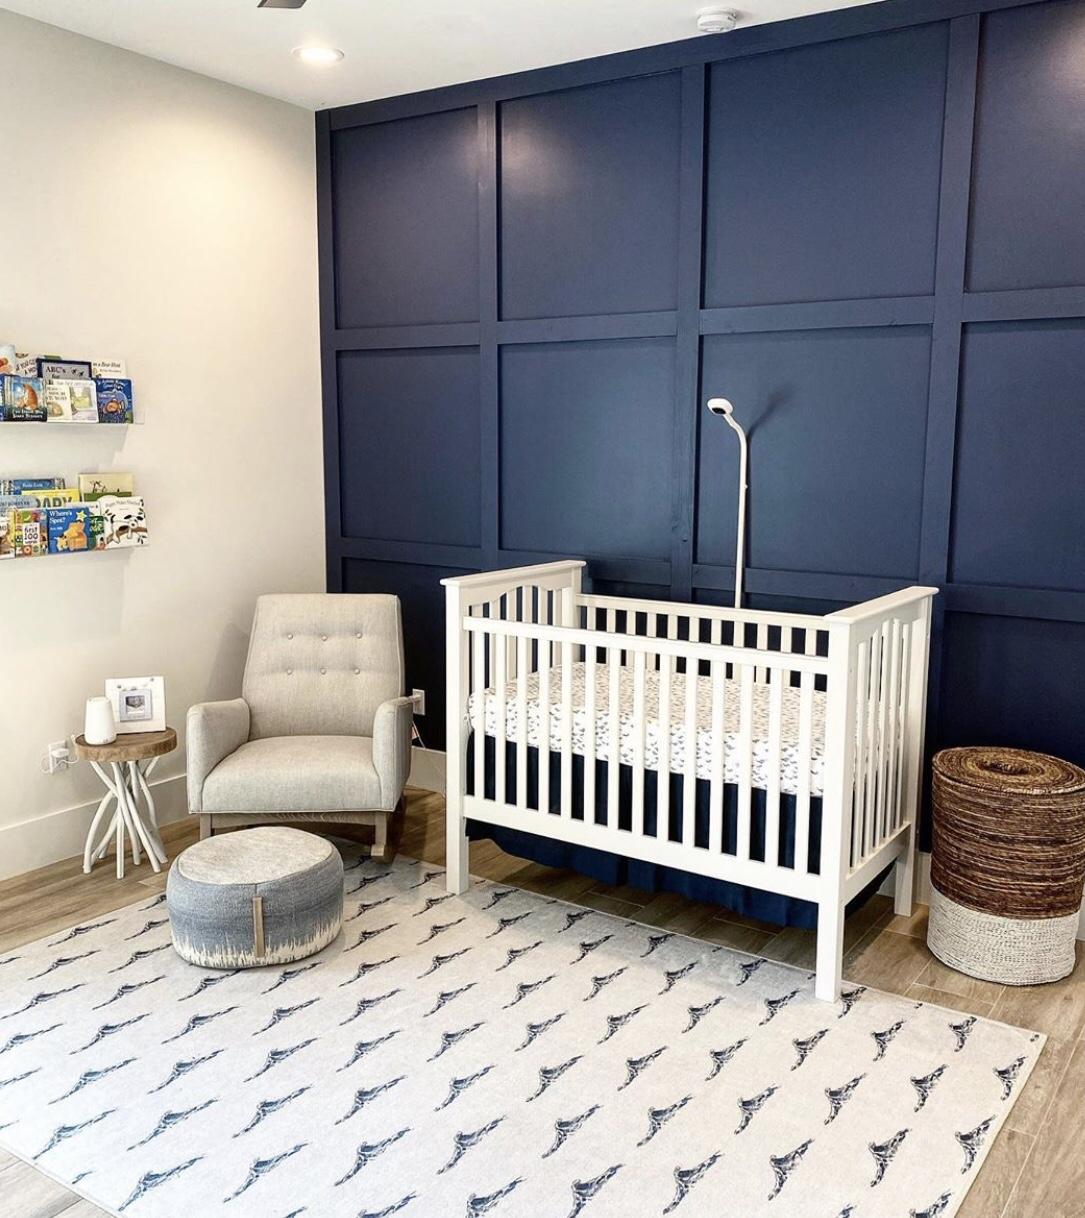 Baby boy nursery-blue textured wall, wall mounted bookshelf